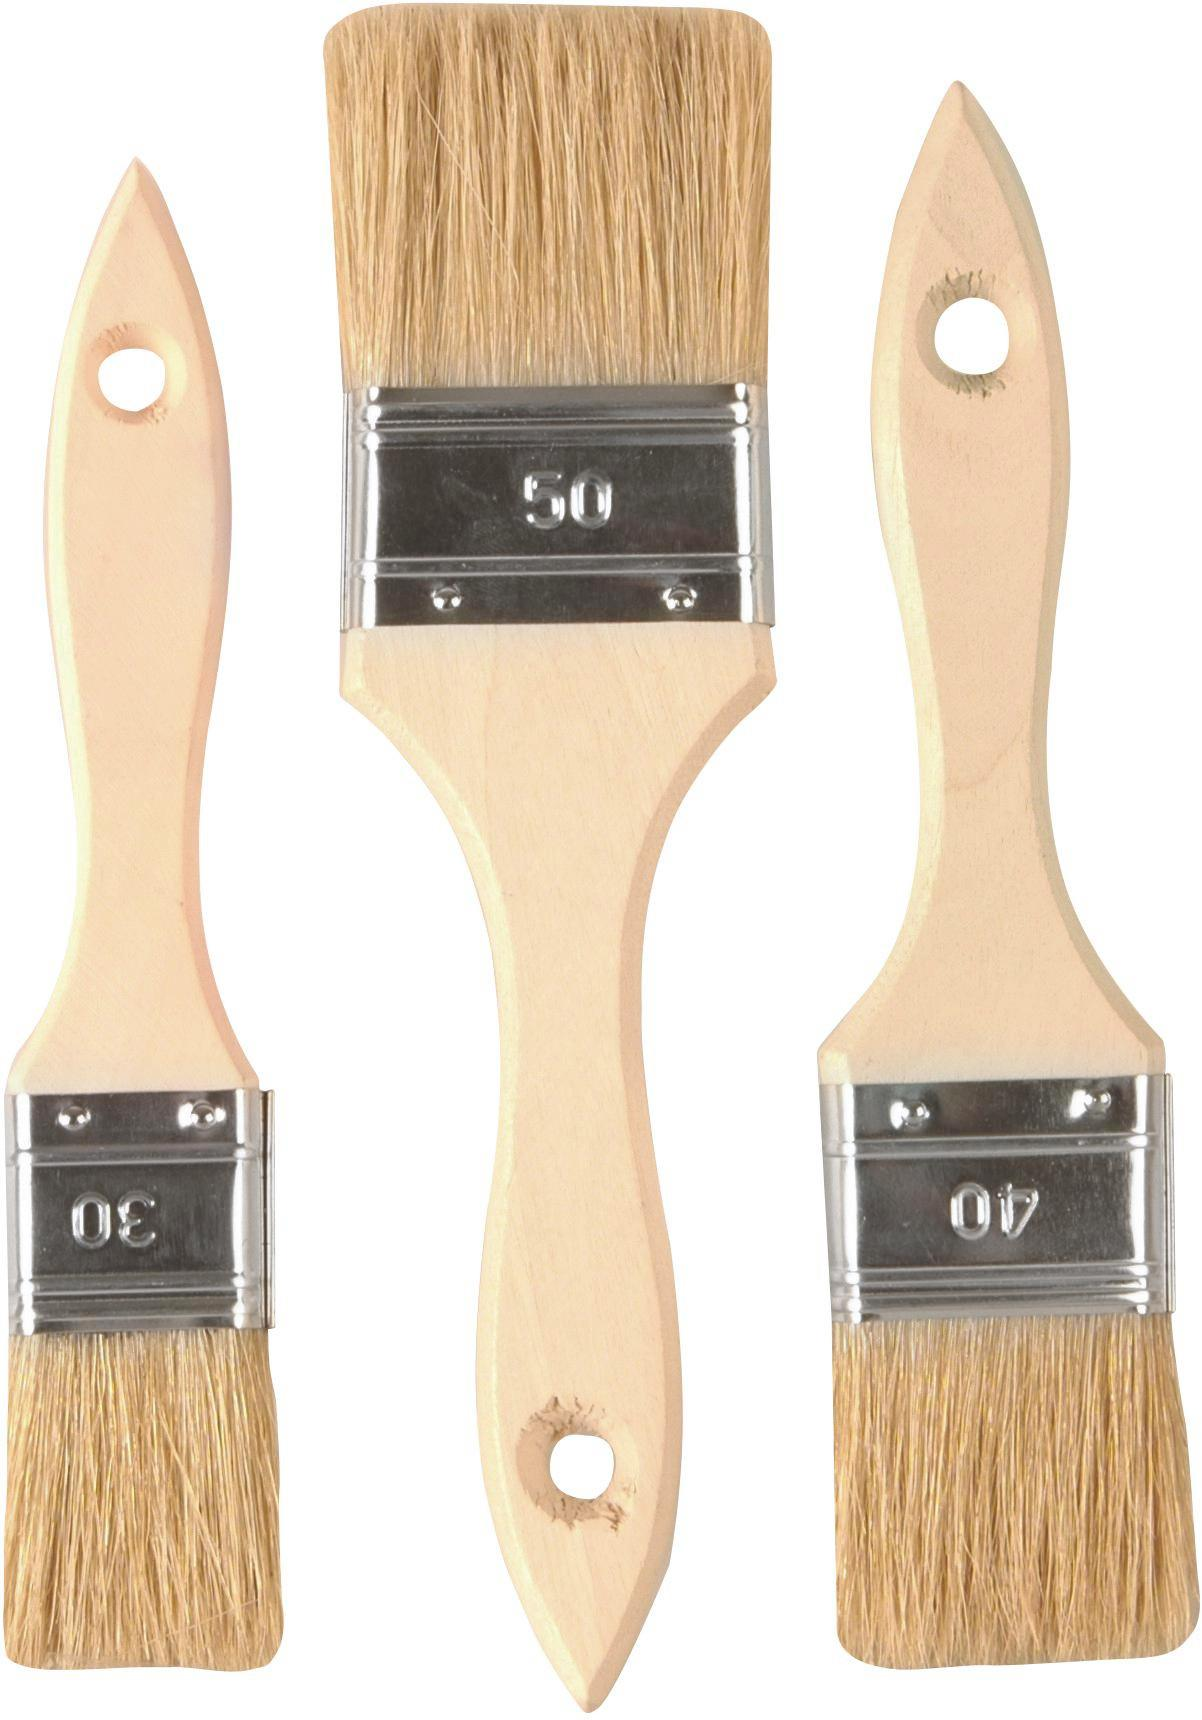 Pinselset Finn, 3-teilig - Holz/Metall